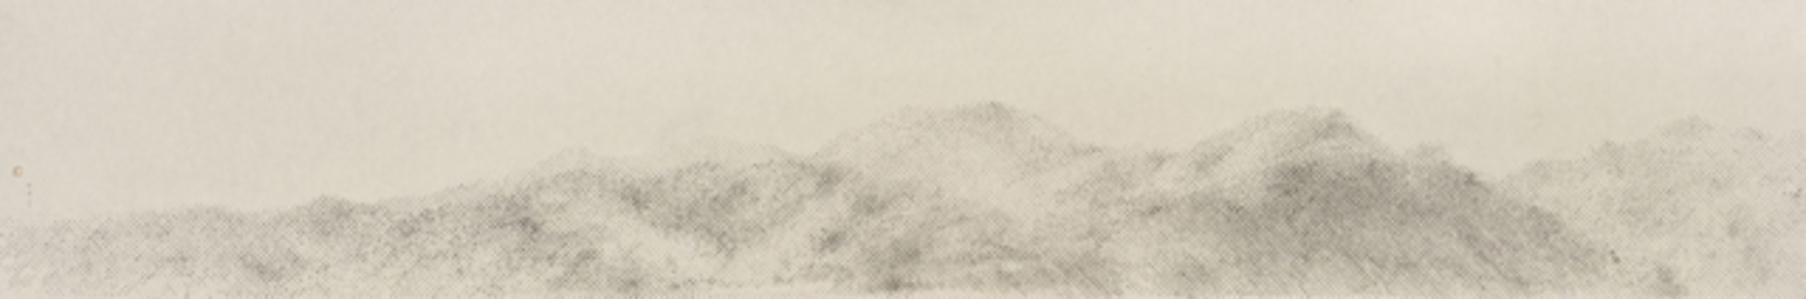 Rivers and Mountains No.3 江山 No.3